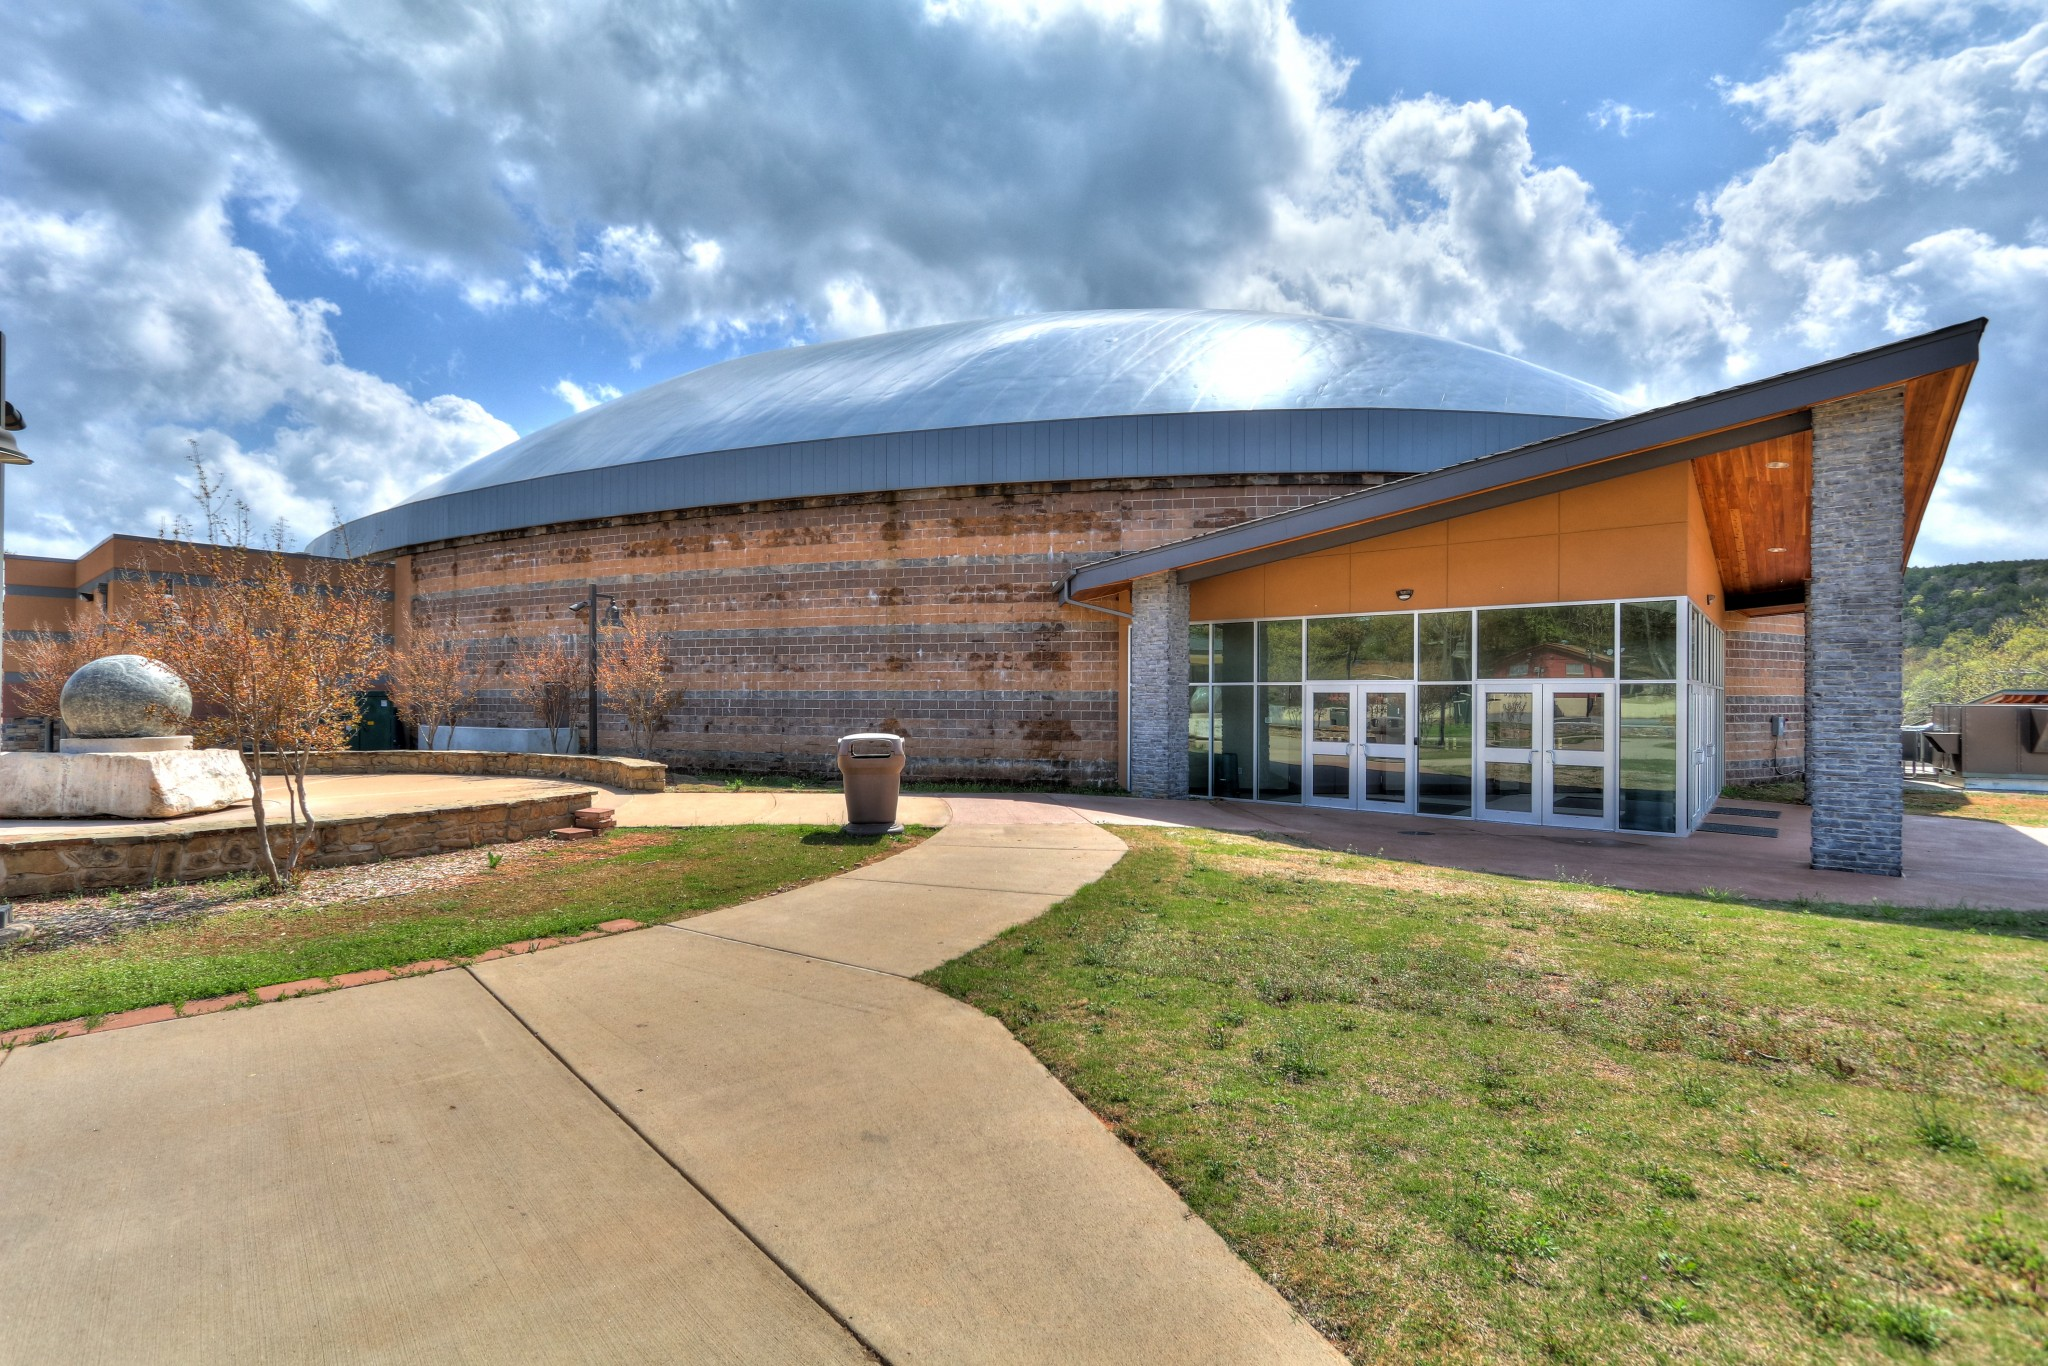 Falls Creek Conference Center